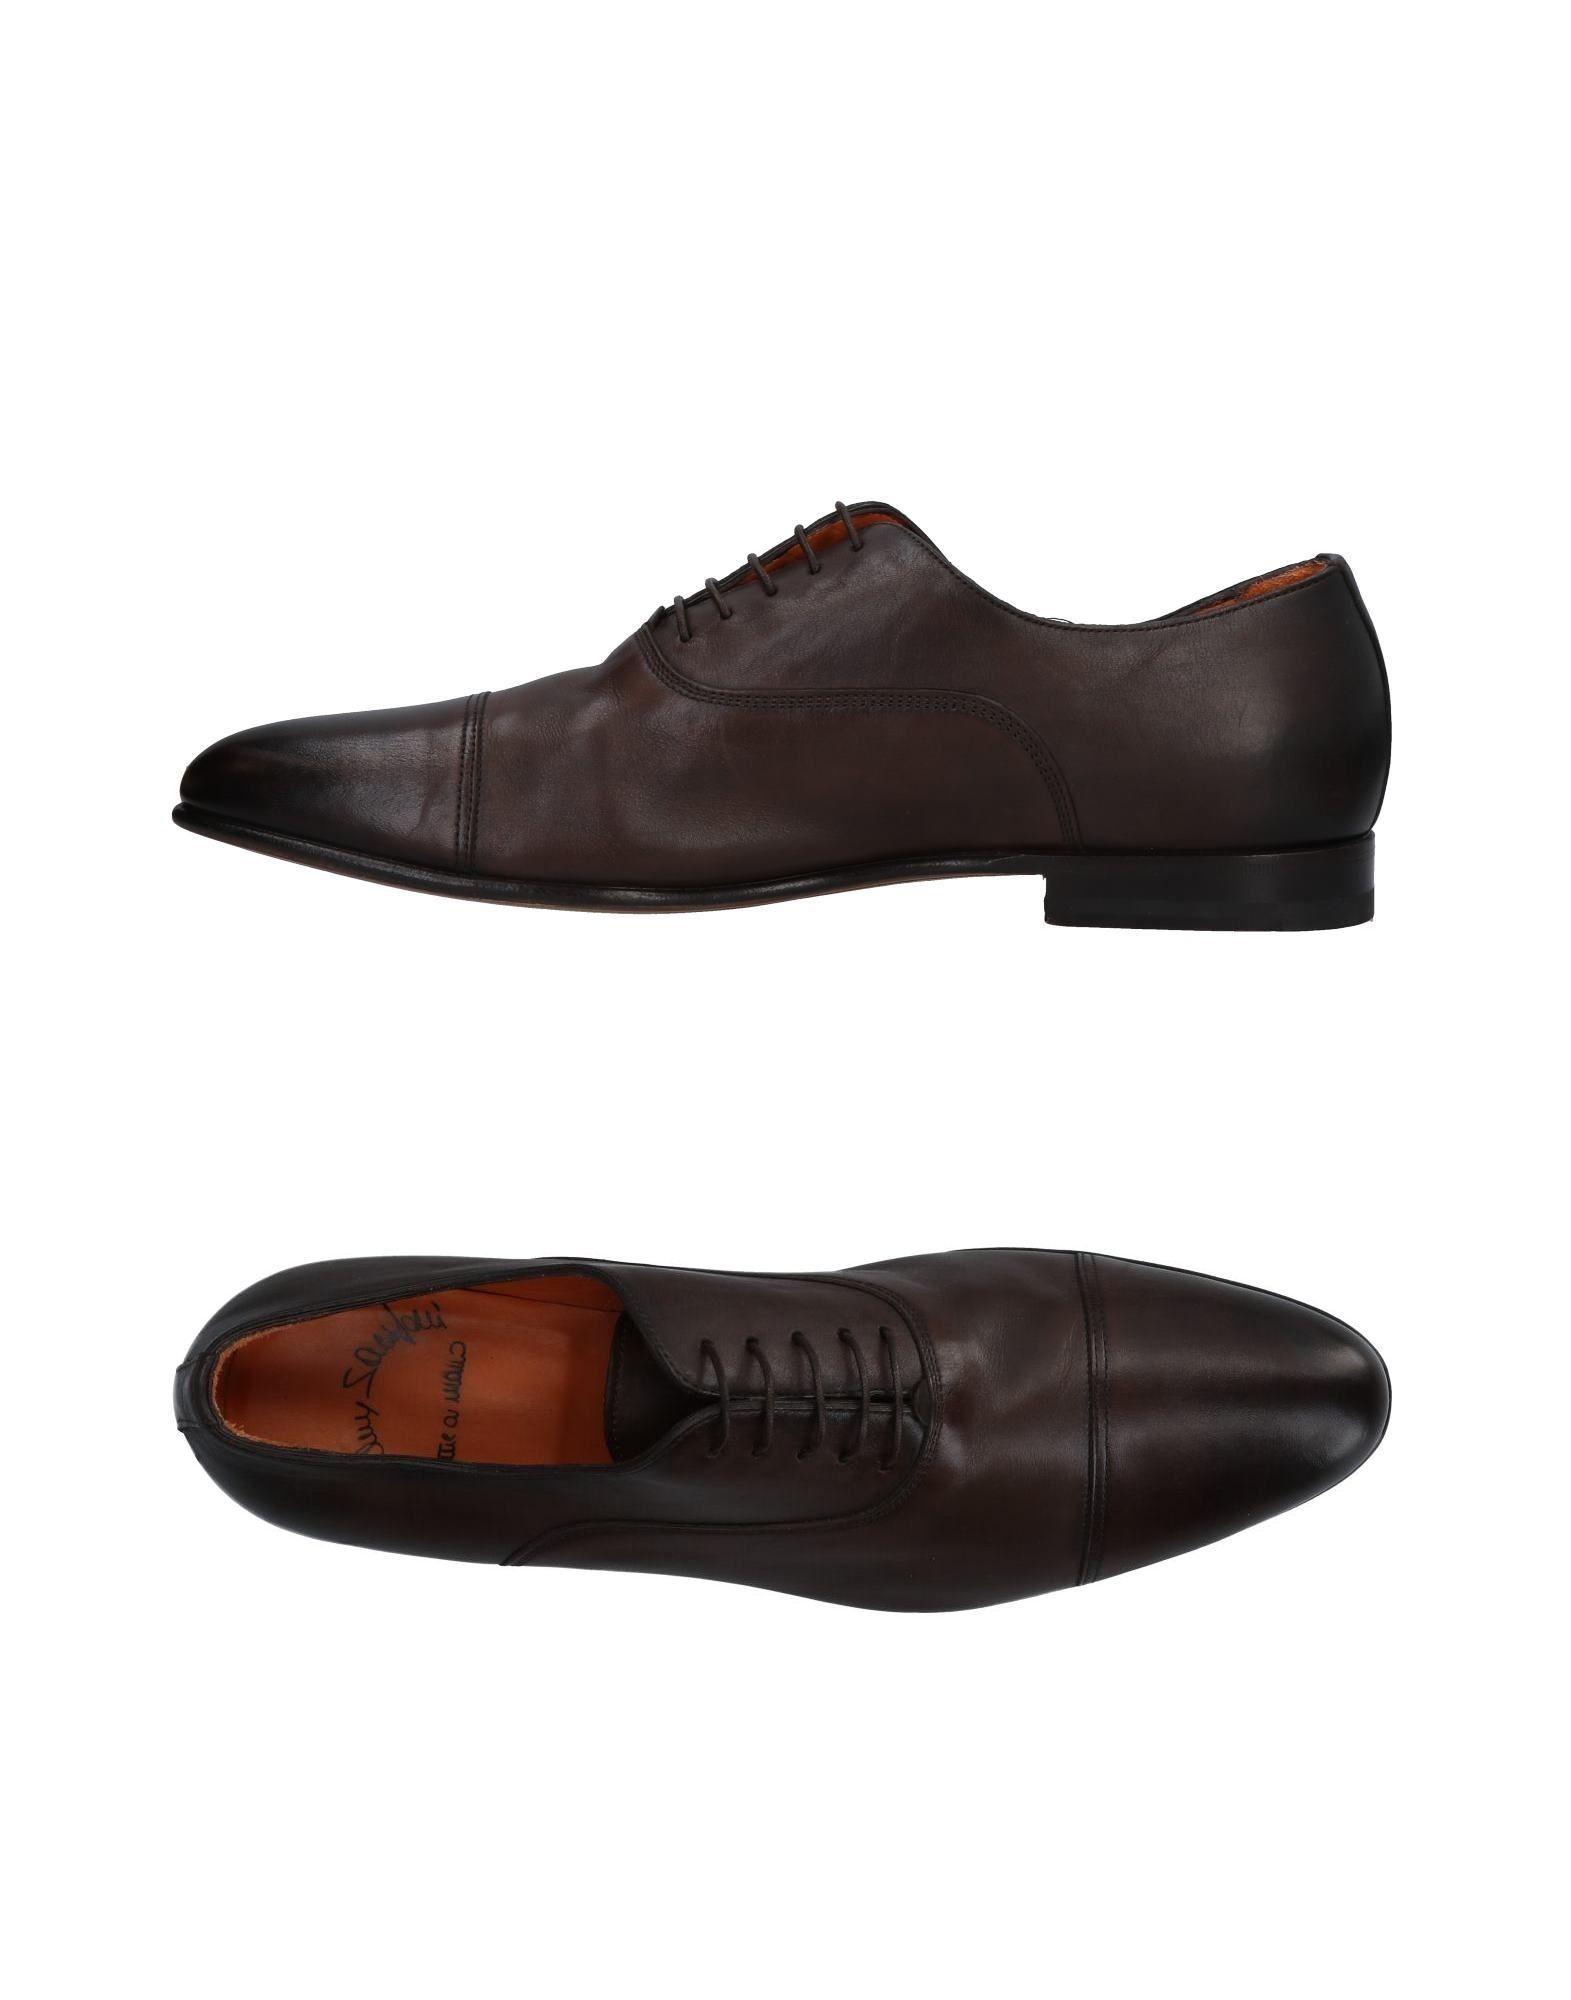 Santoni Schnürschuhe Herren  11469077AN Gute Qualität beliebte Schuhe